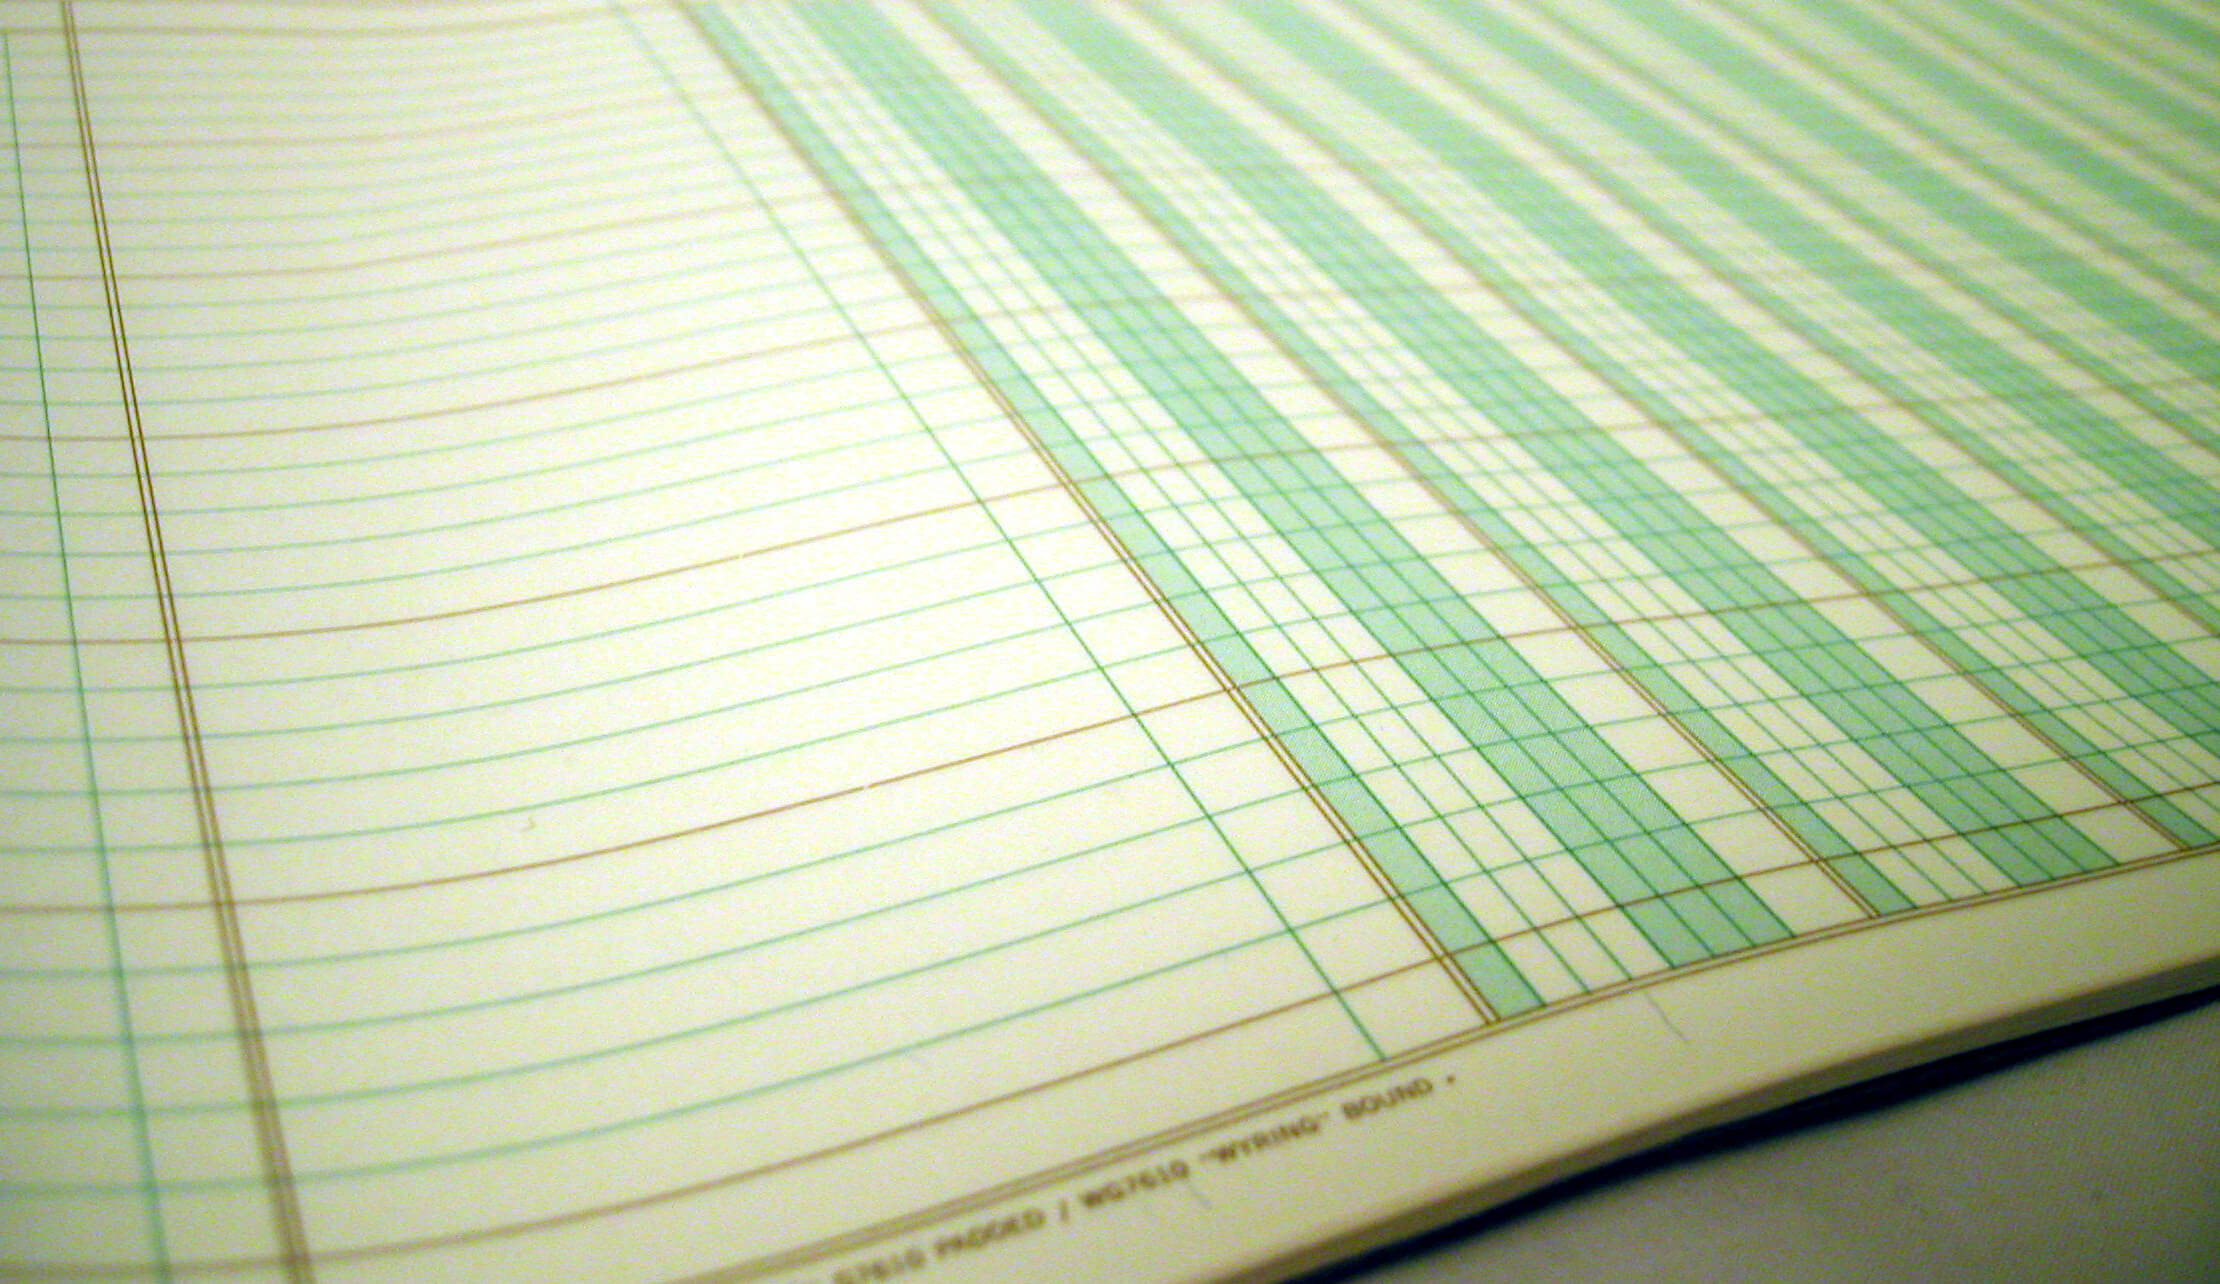 Optimiranje davčne bilance